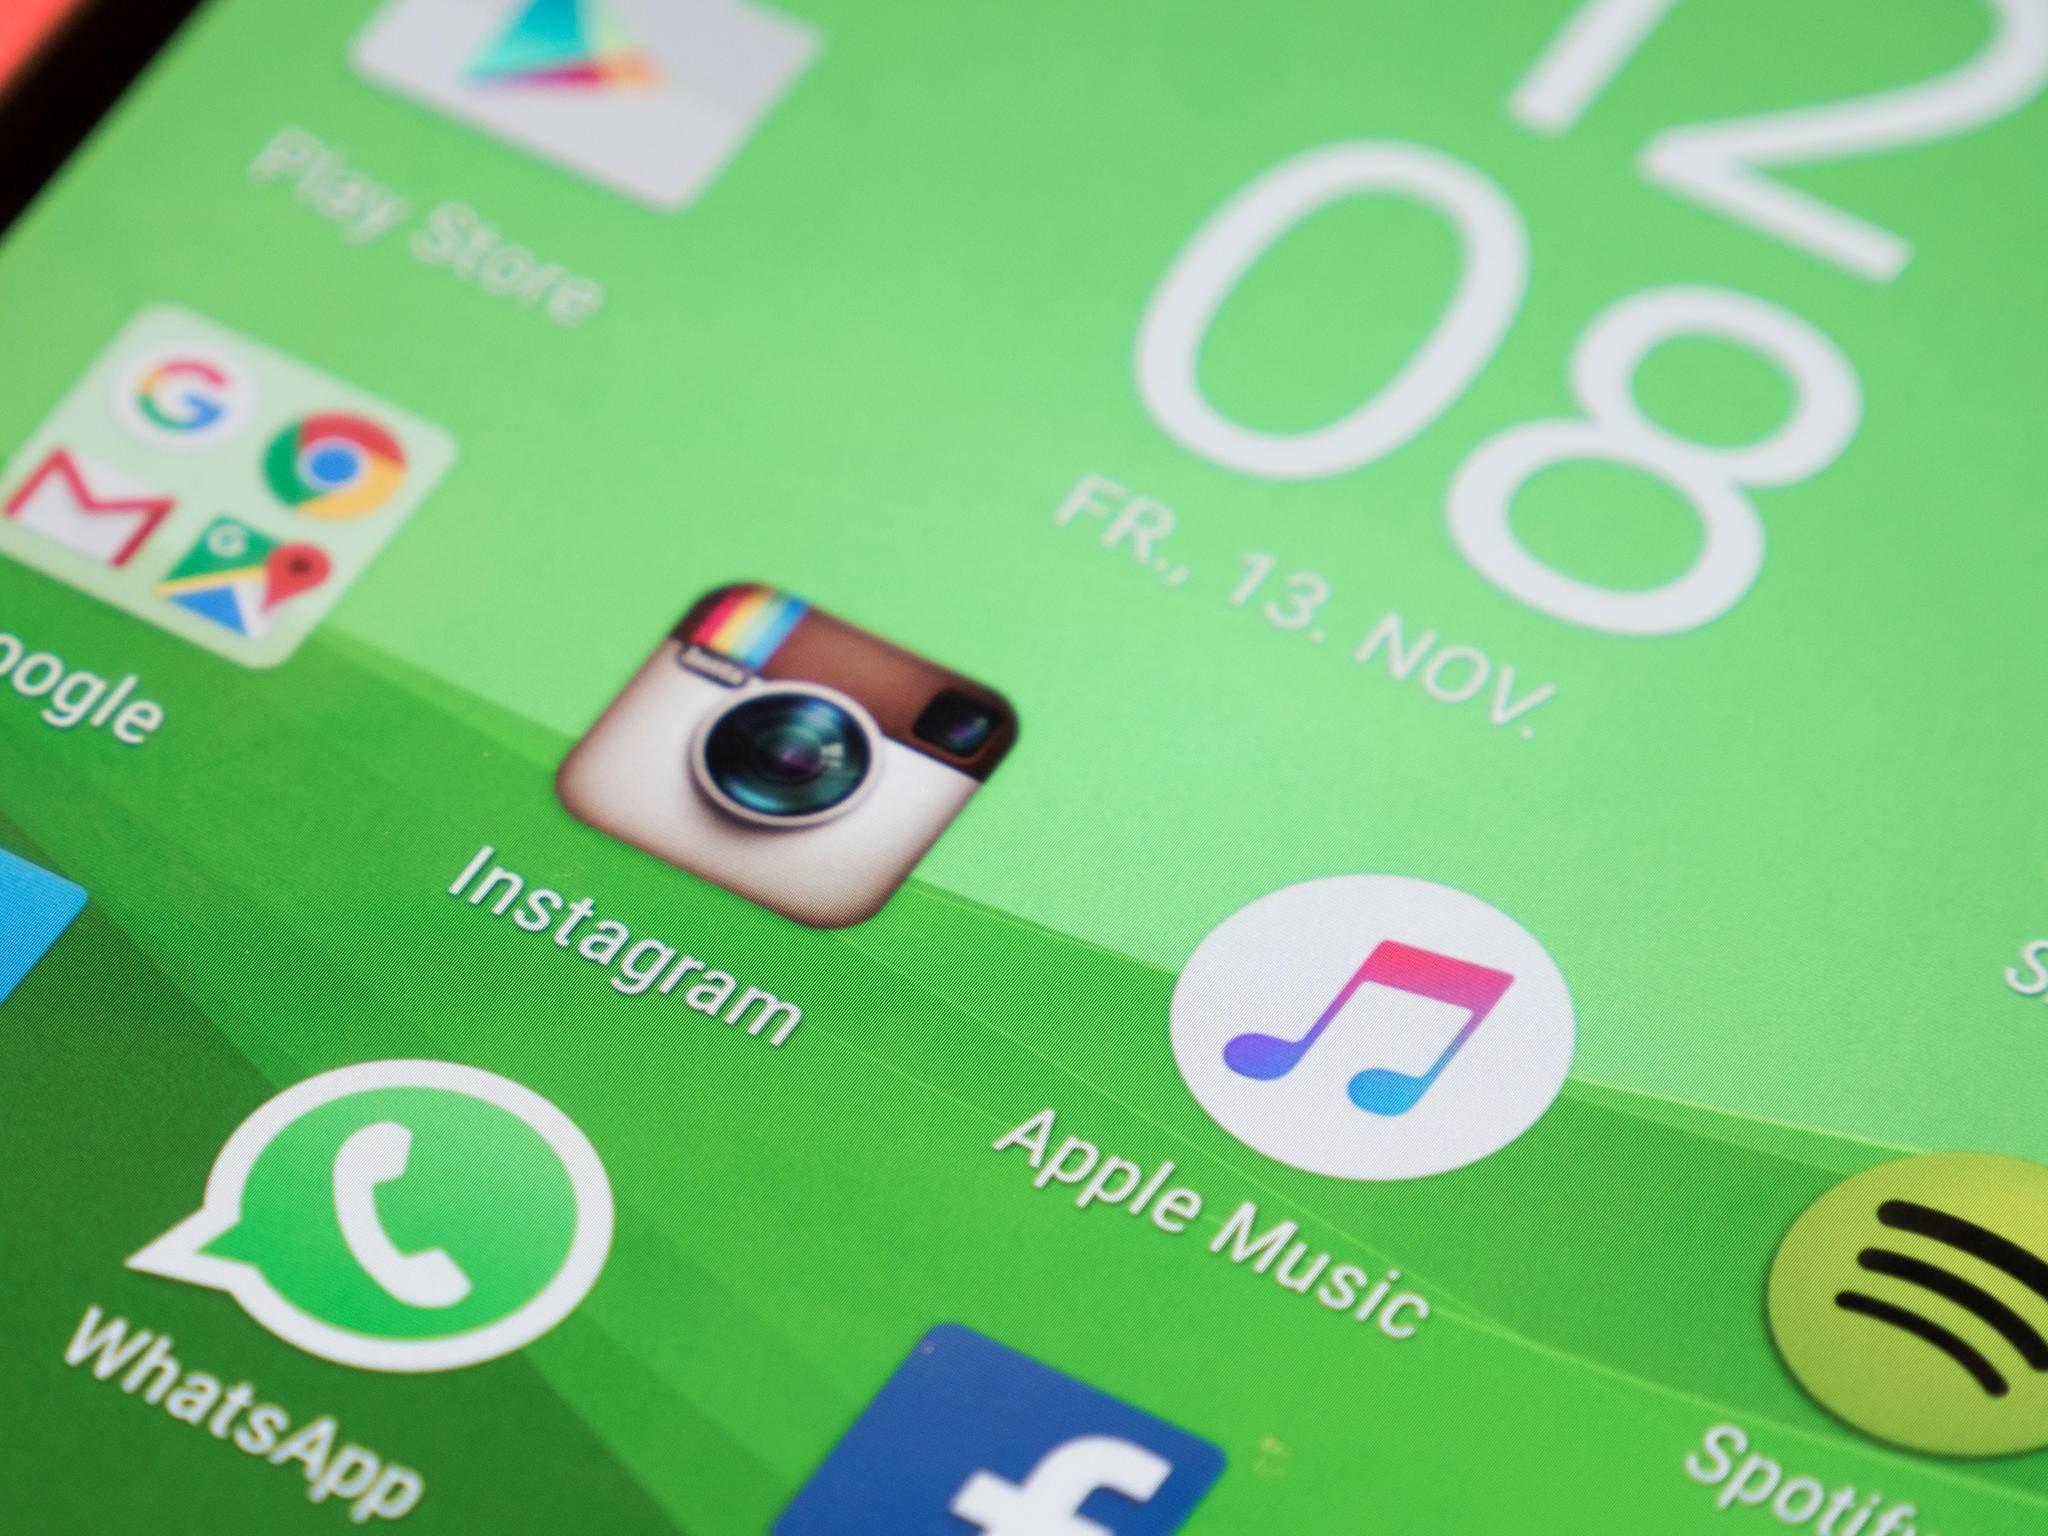 Instagram, Apple Music